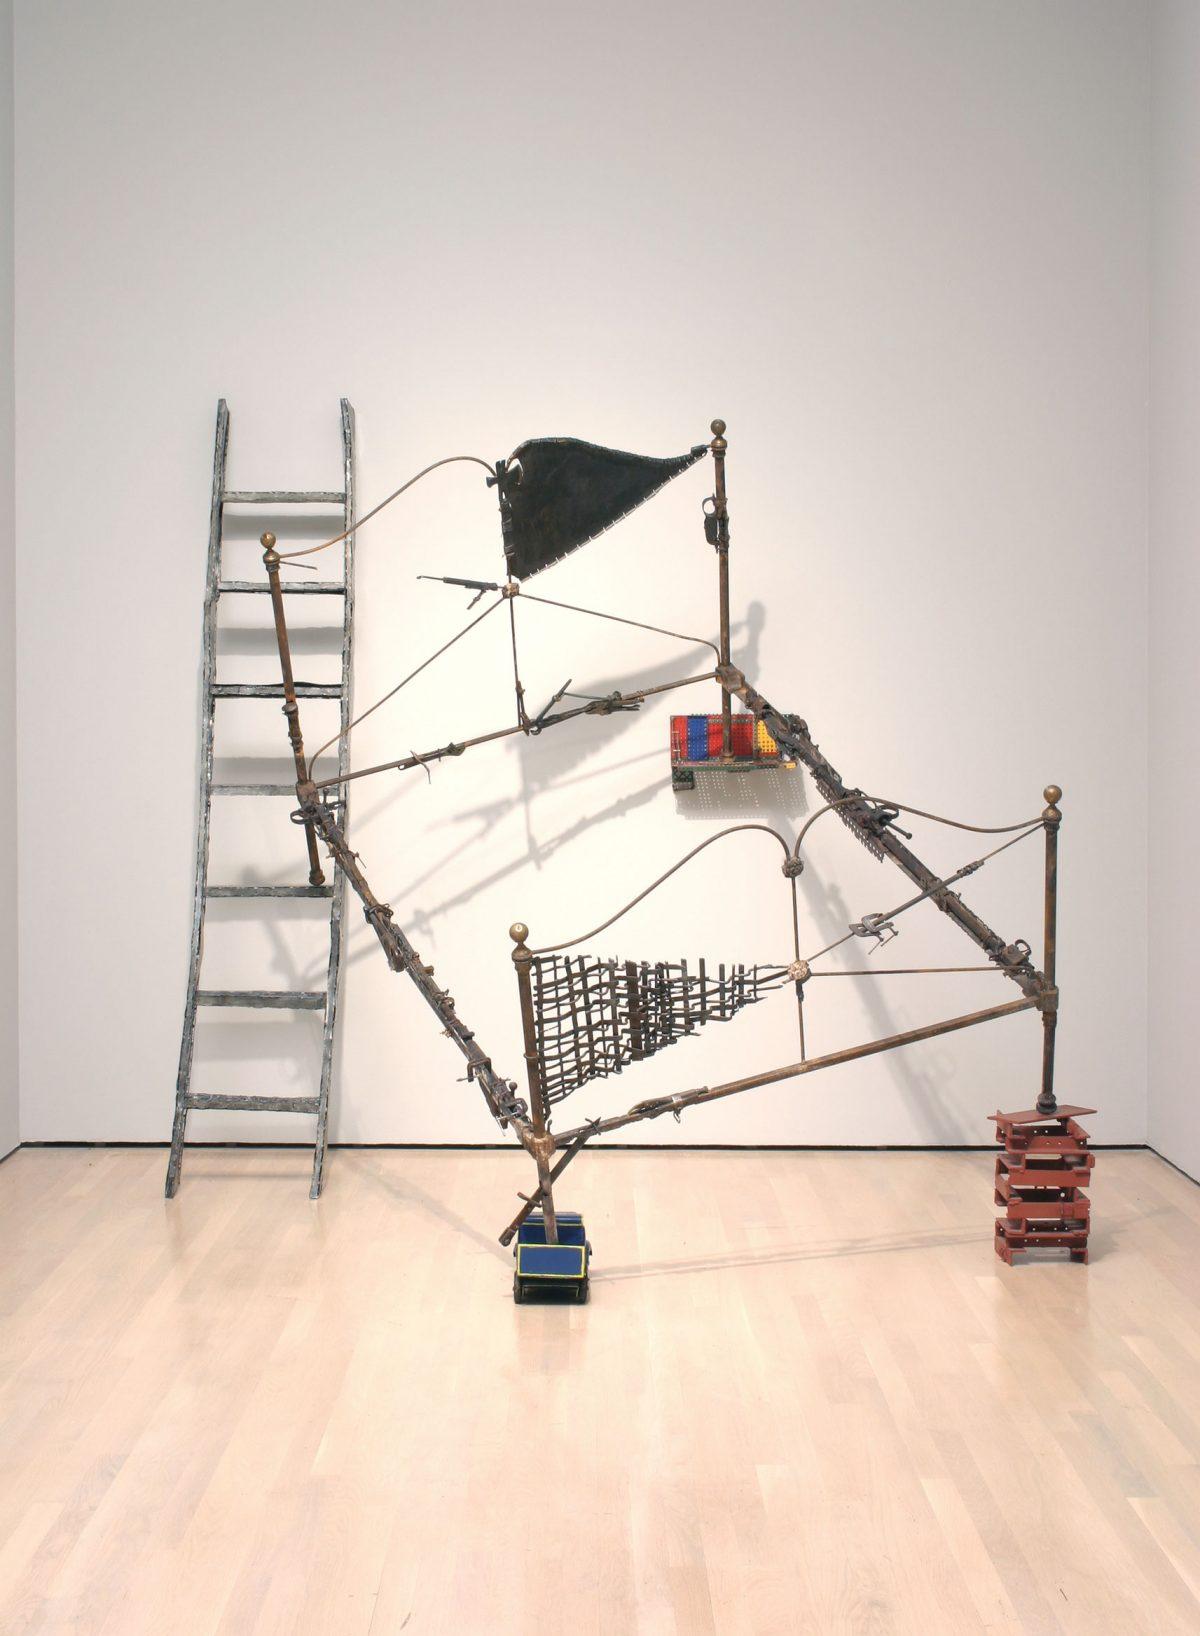 Trophée, 1986, Steel and various objets.